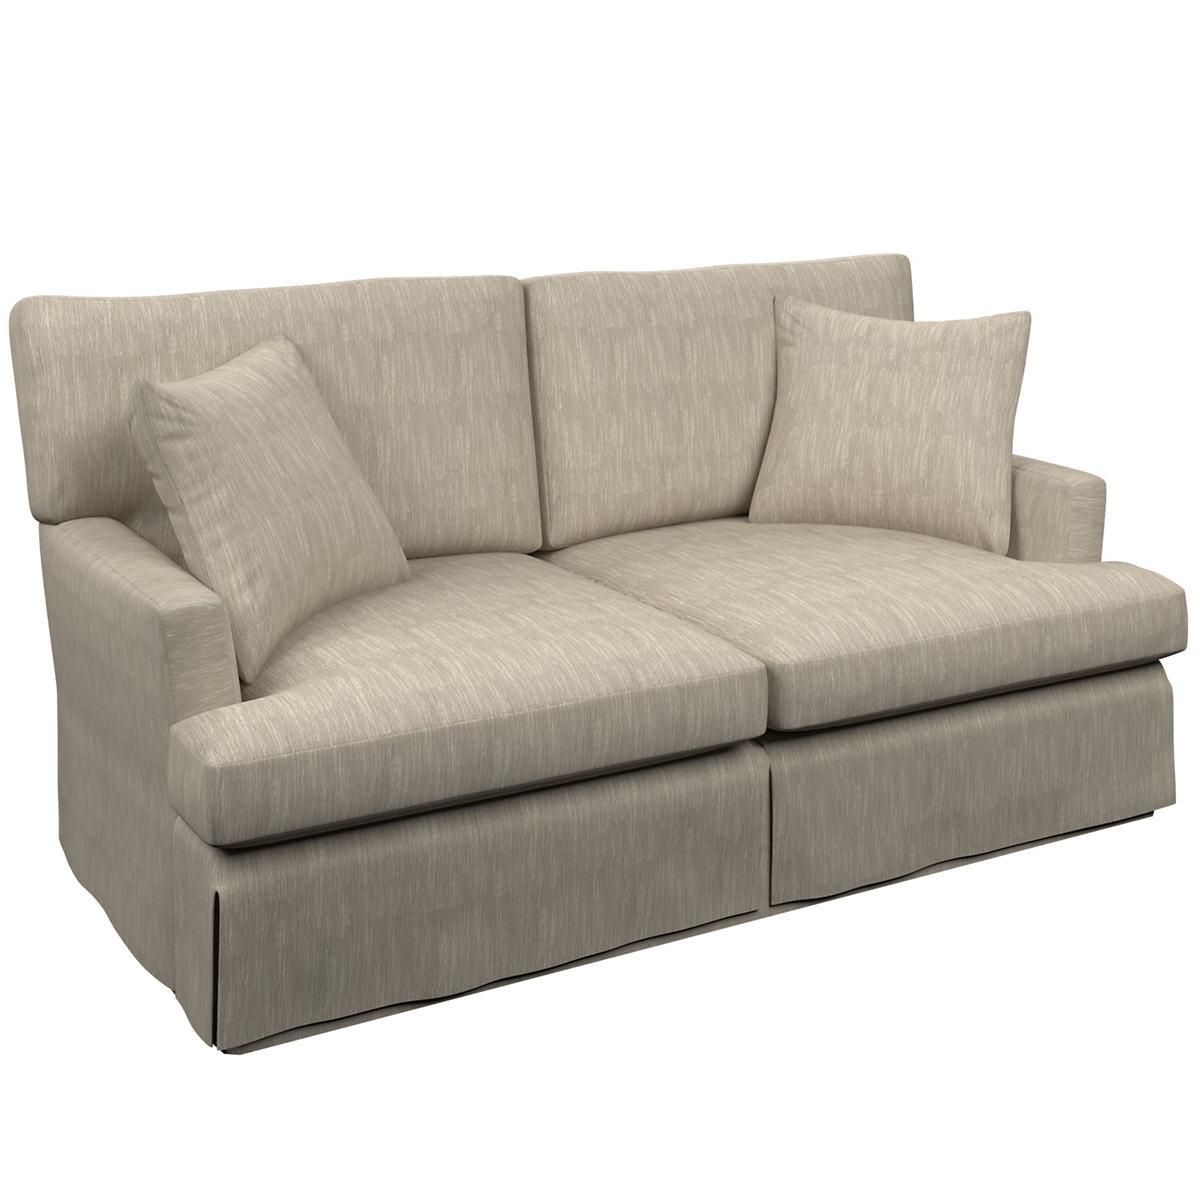 Graduate Linen Saybrook 2 Seater Sofa